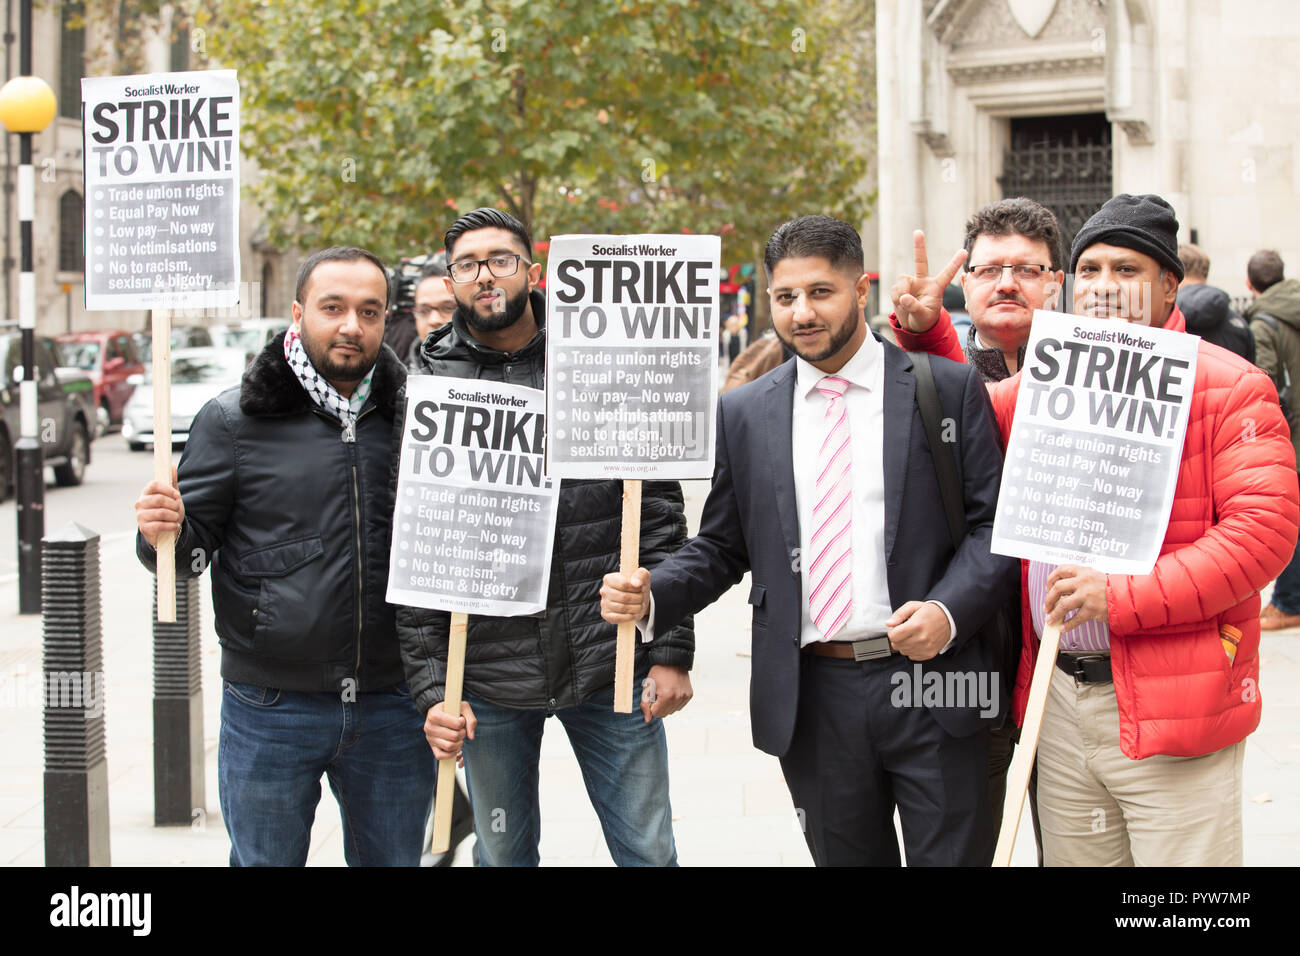 Uber London Stock Photos & Uber London Stock Images - Alamy